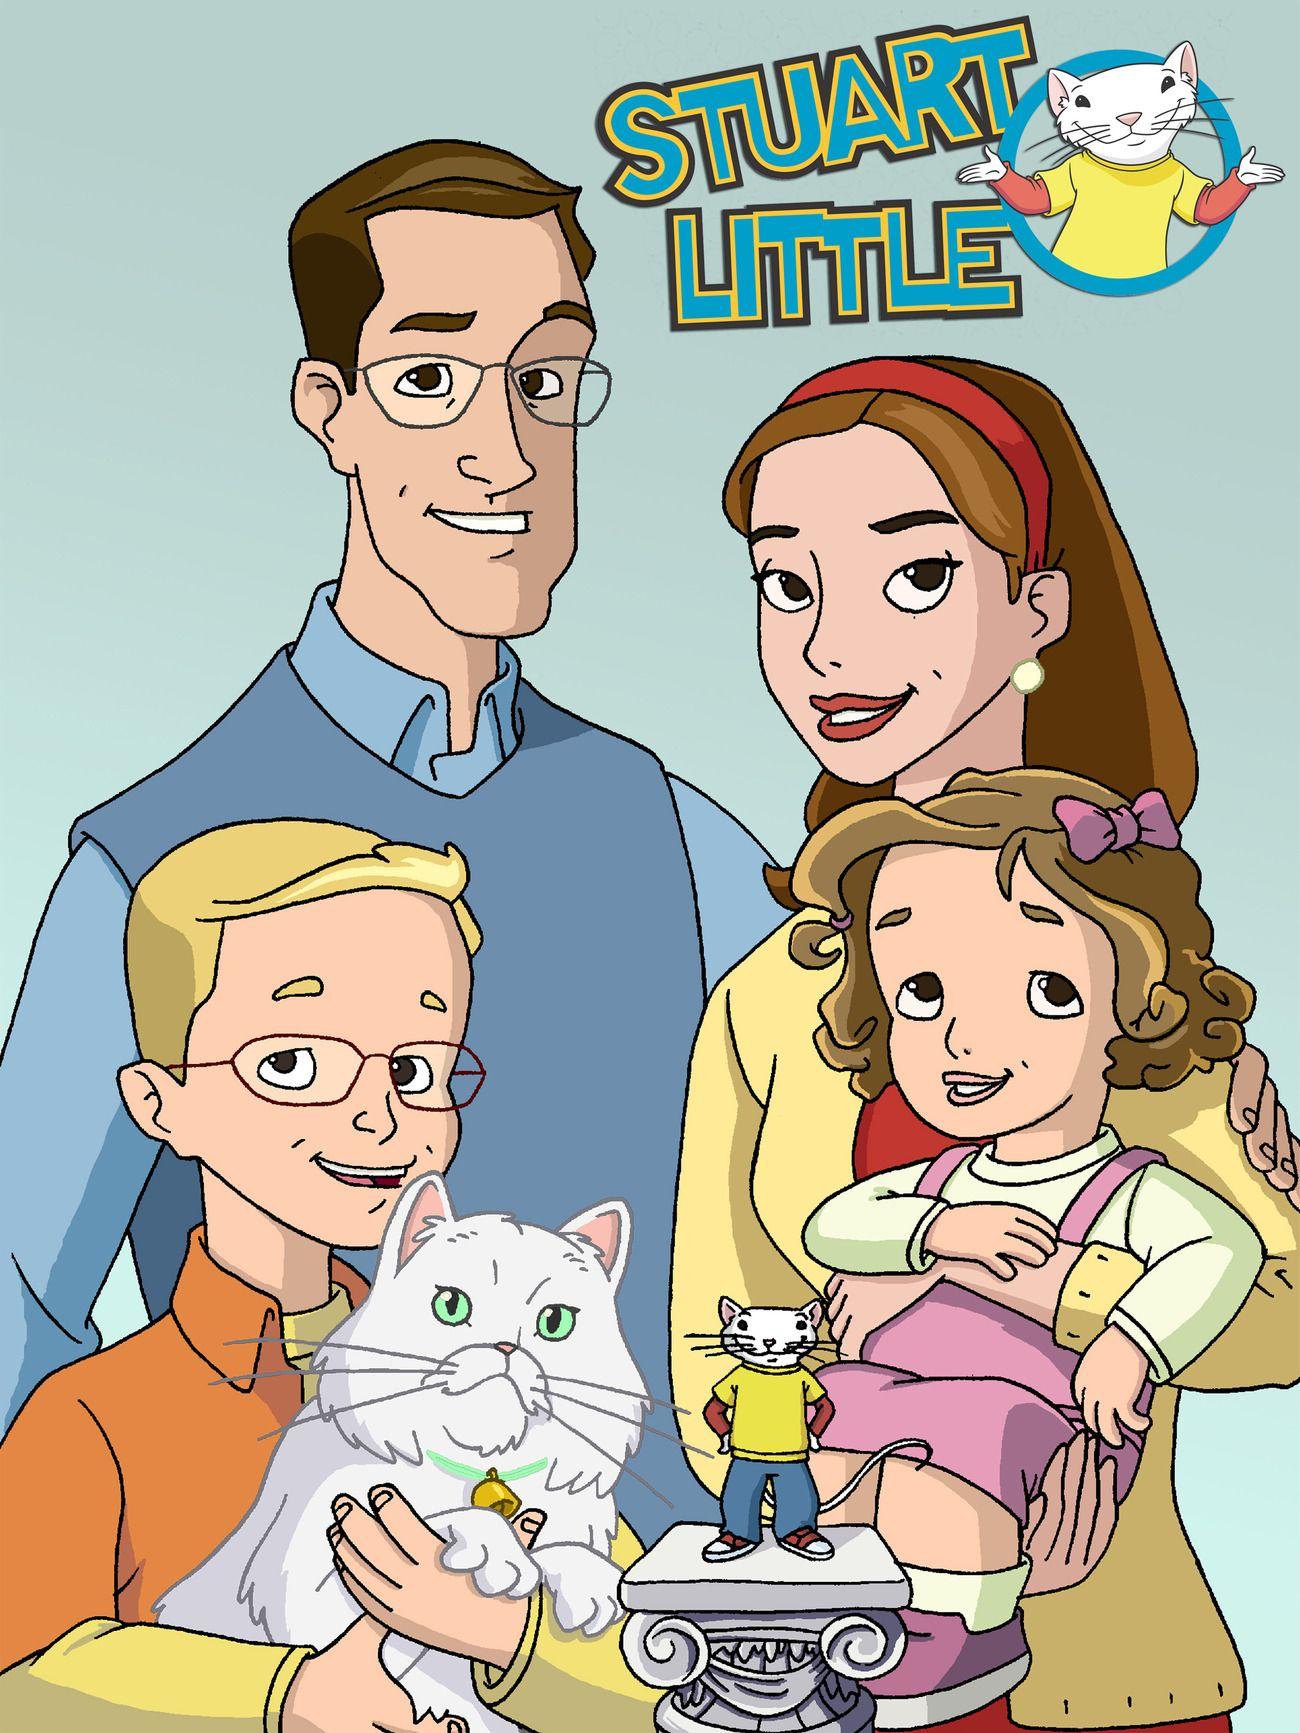 Stuart Little Tv Show News Videos Full Episodes And More Stuart Little Character Design Couple Illustration